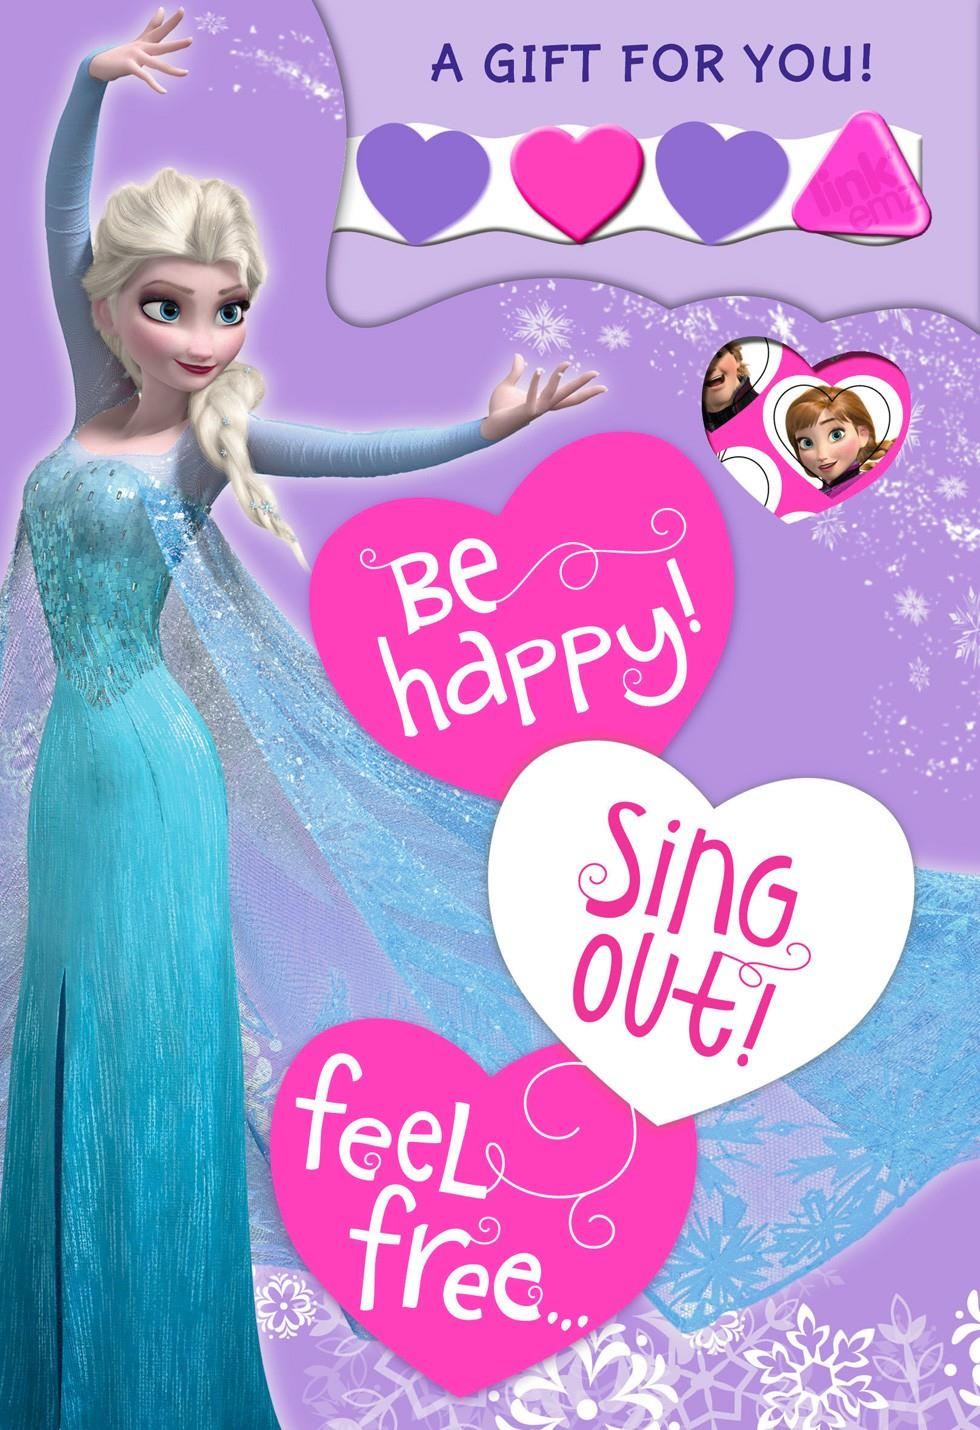 Disney Frozen Elsa Valentineu0027s Day Card With Linku0027emz Wristband